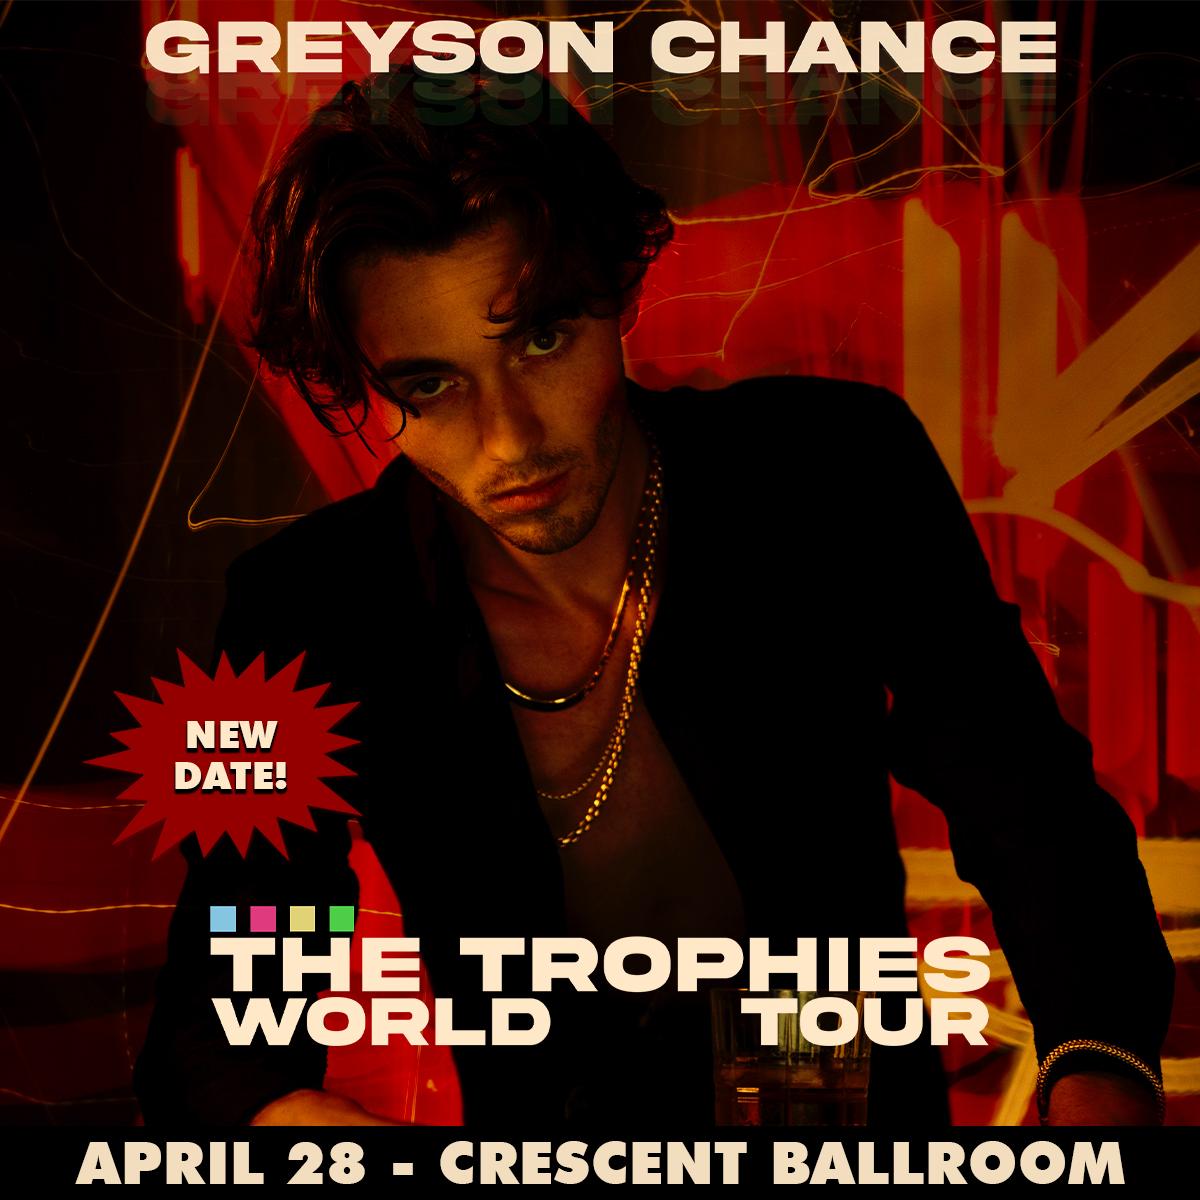 Greyson Chance: